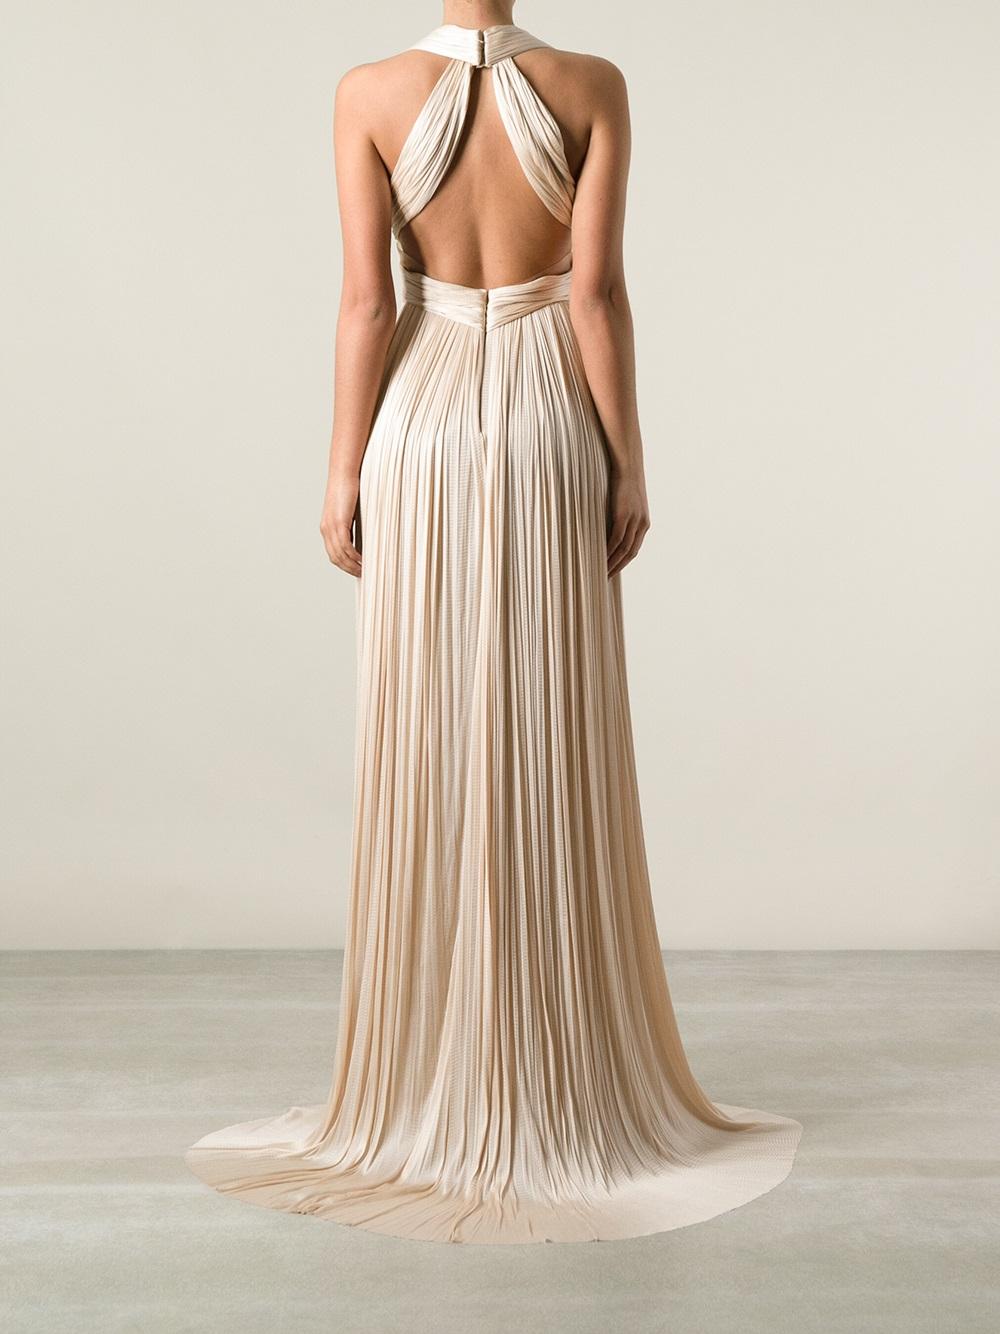 DRESSES - Short dresses Maria Lucia Hohan cFowB